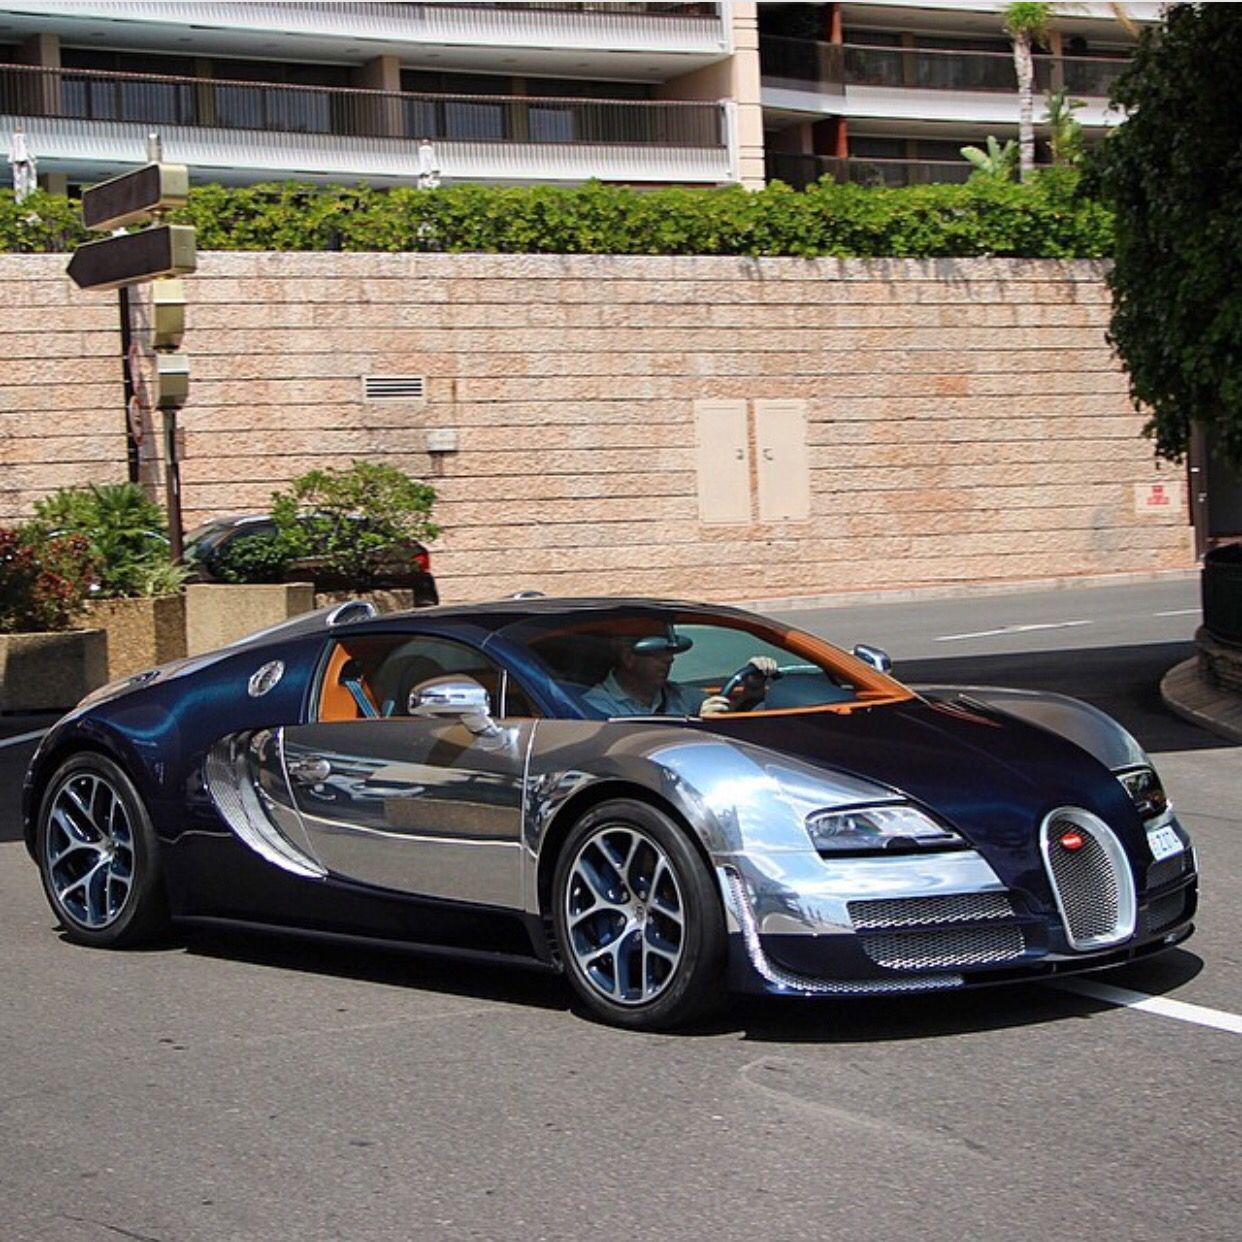 Bugatti Grand Sport Vitesse Painted In Chrome W Navy Blue Carbon